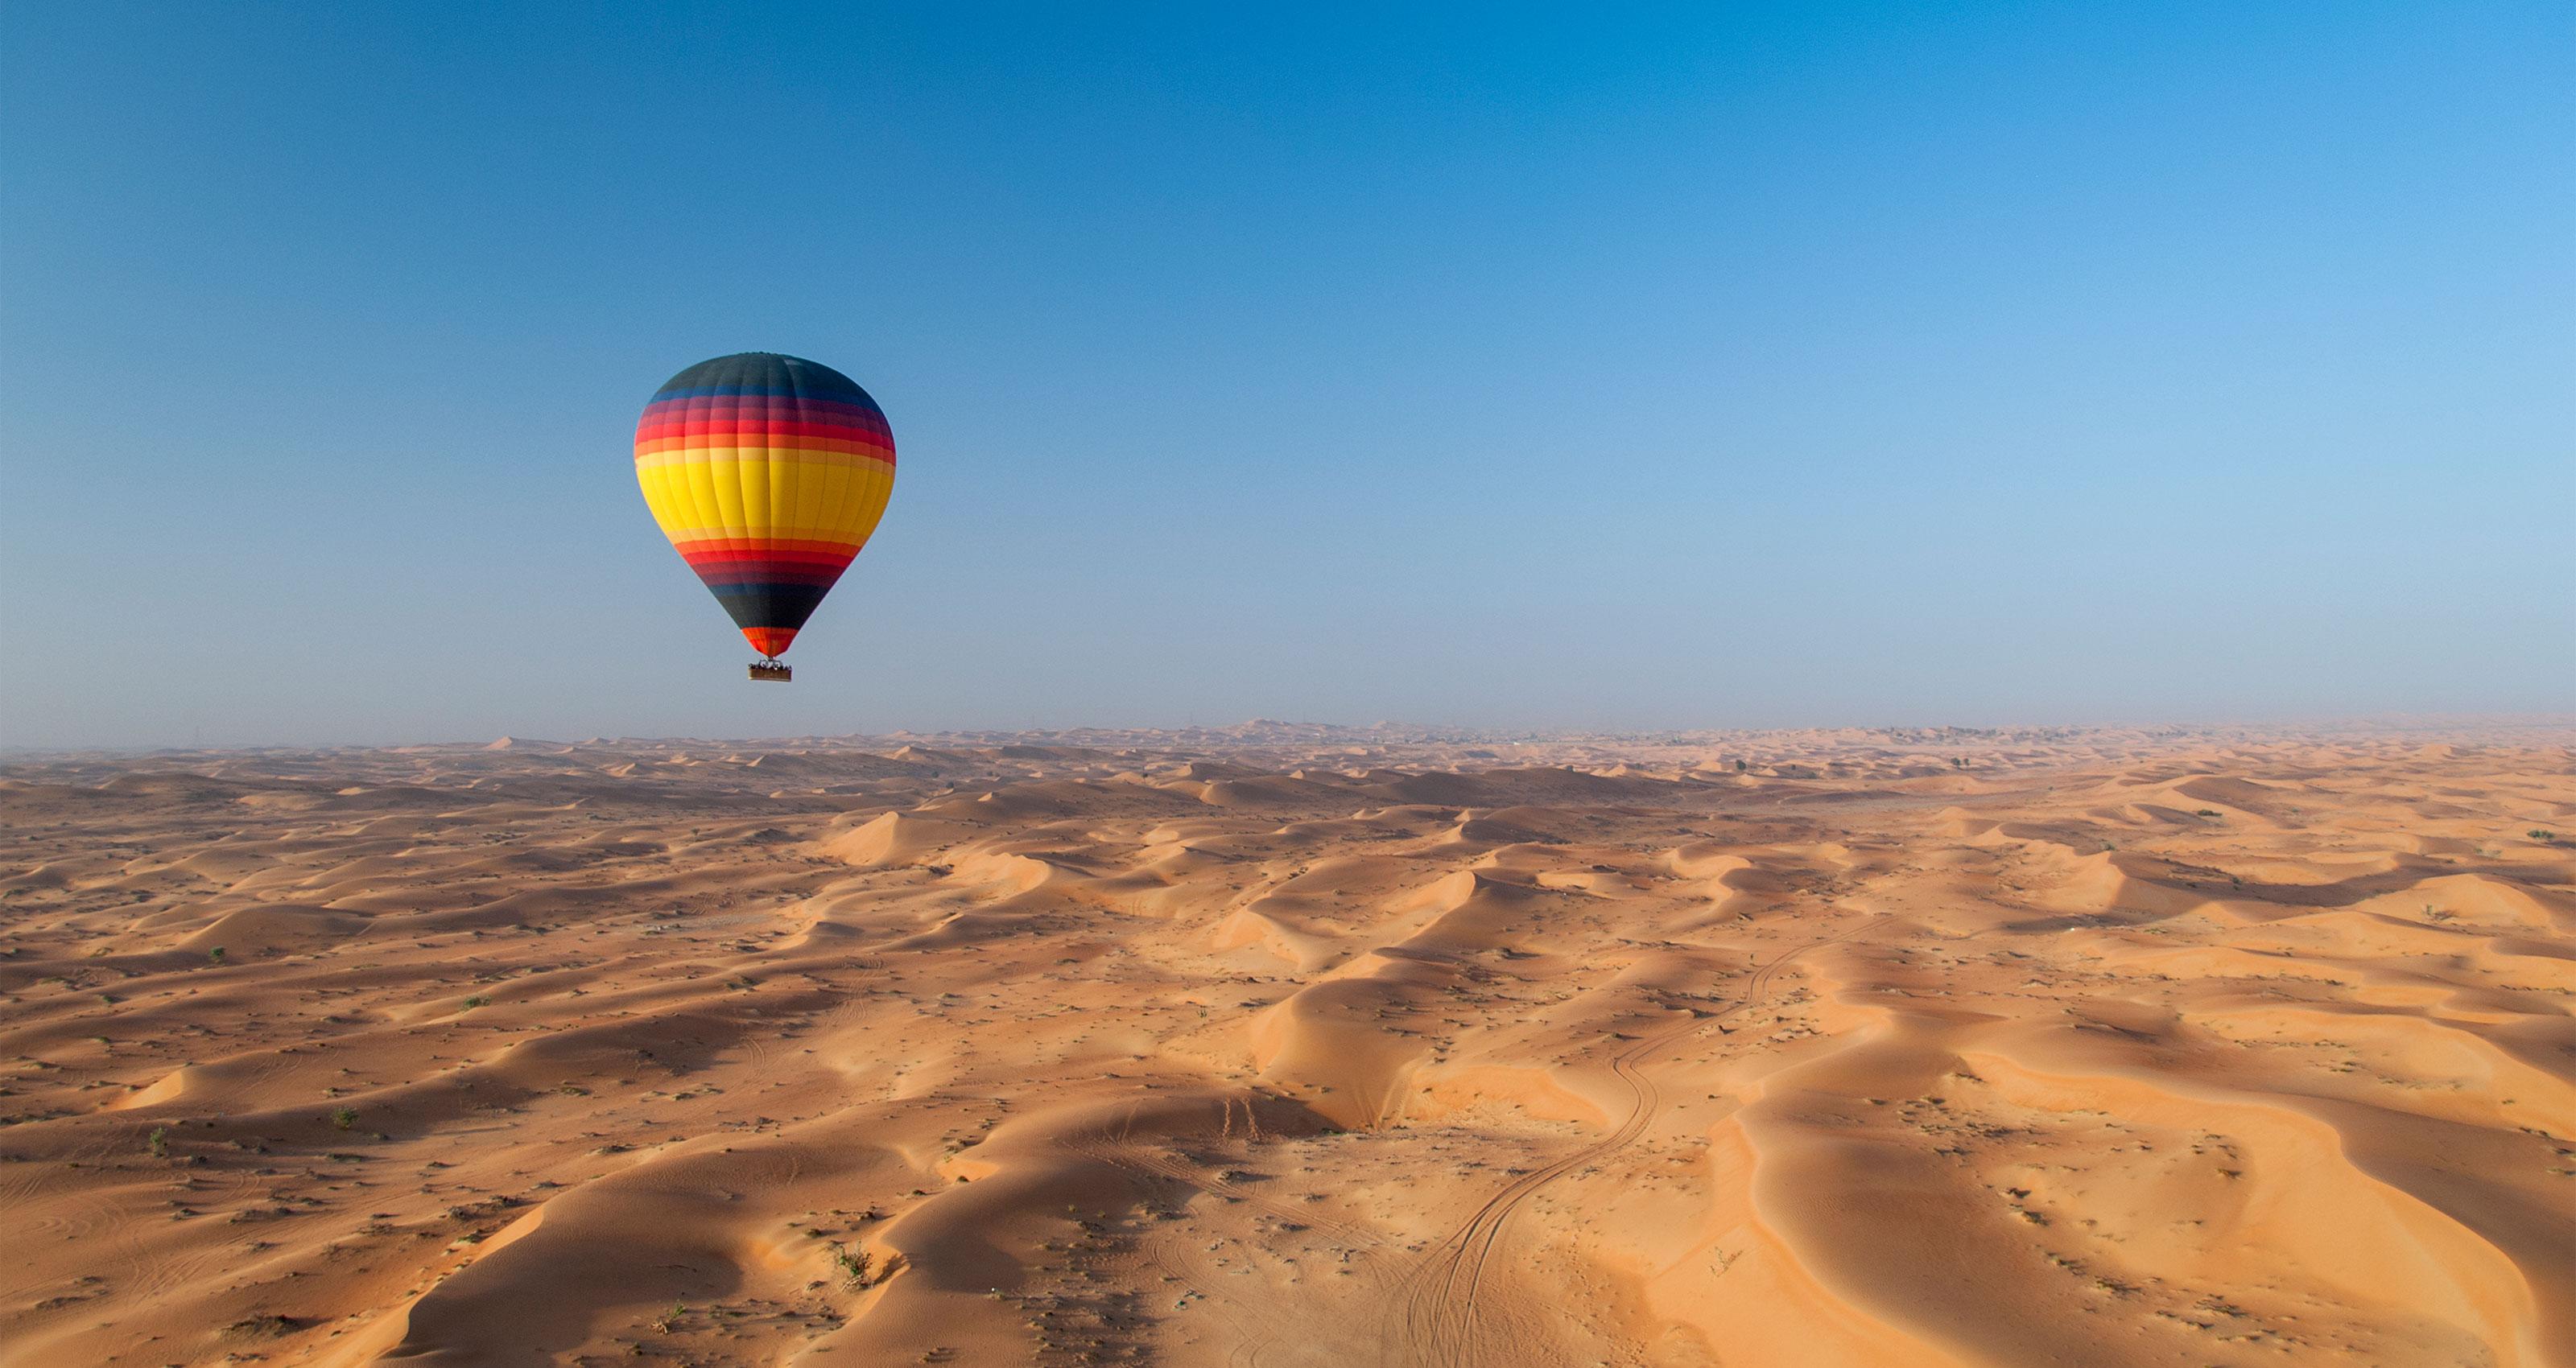 Enjoy hot-air ballooning